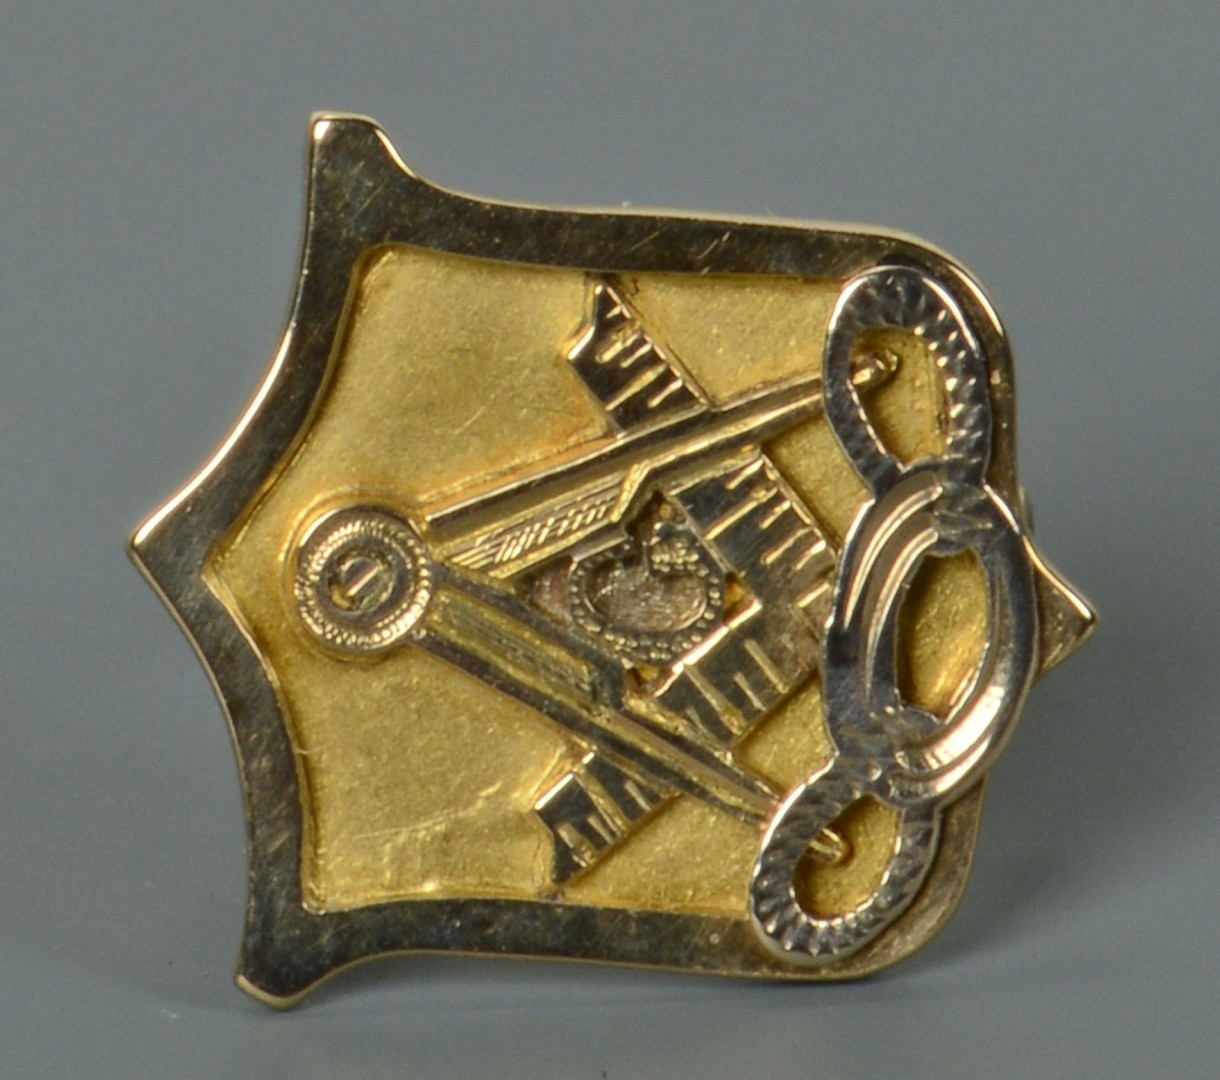 14k Masonic Pin, Donelson inscription